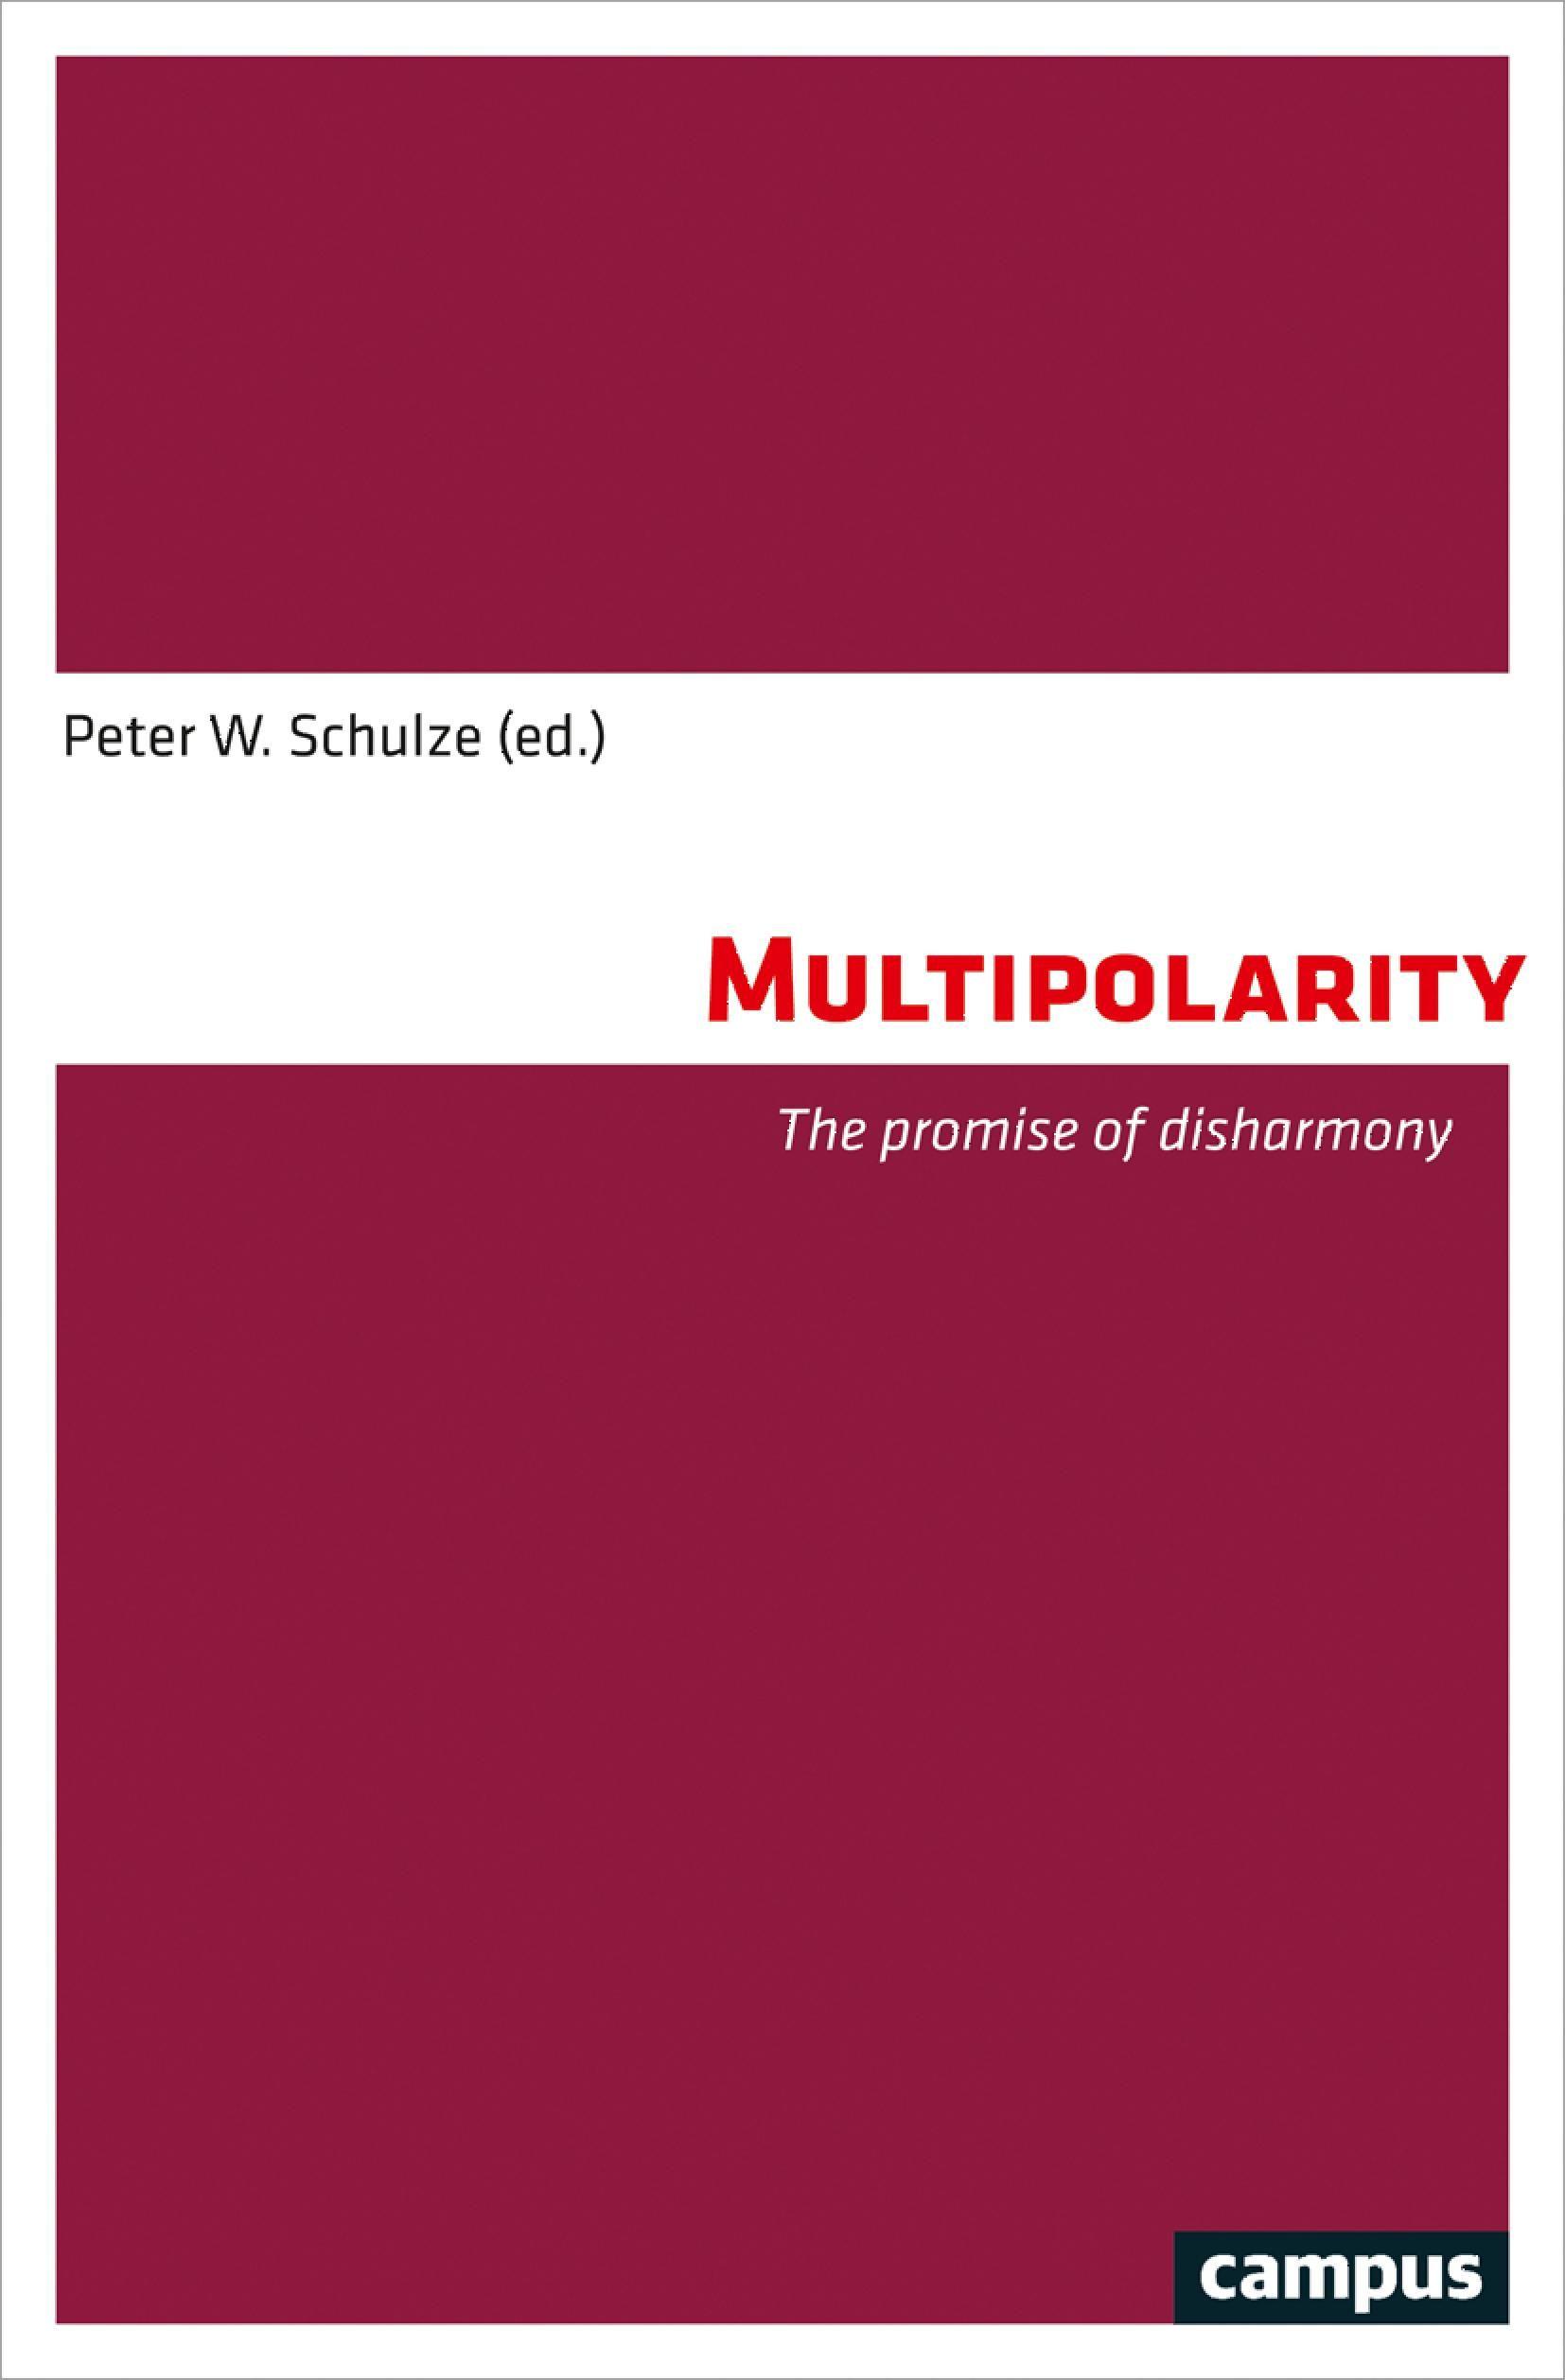 Multipolarity: The promise of disharmony